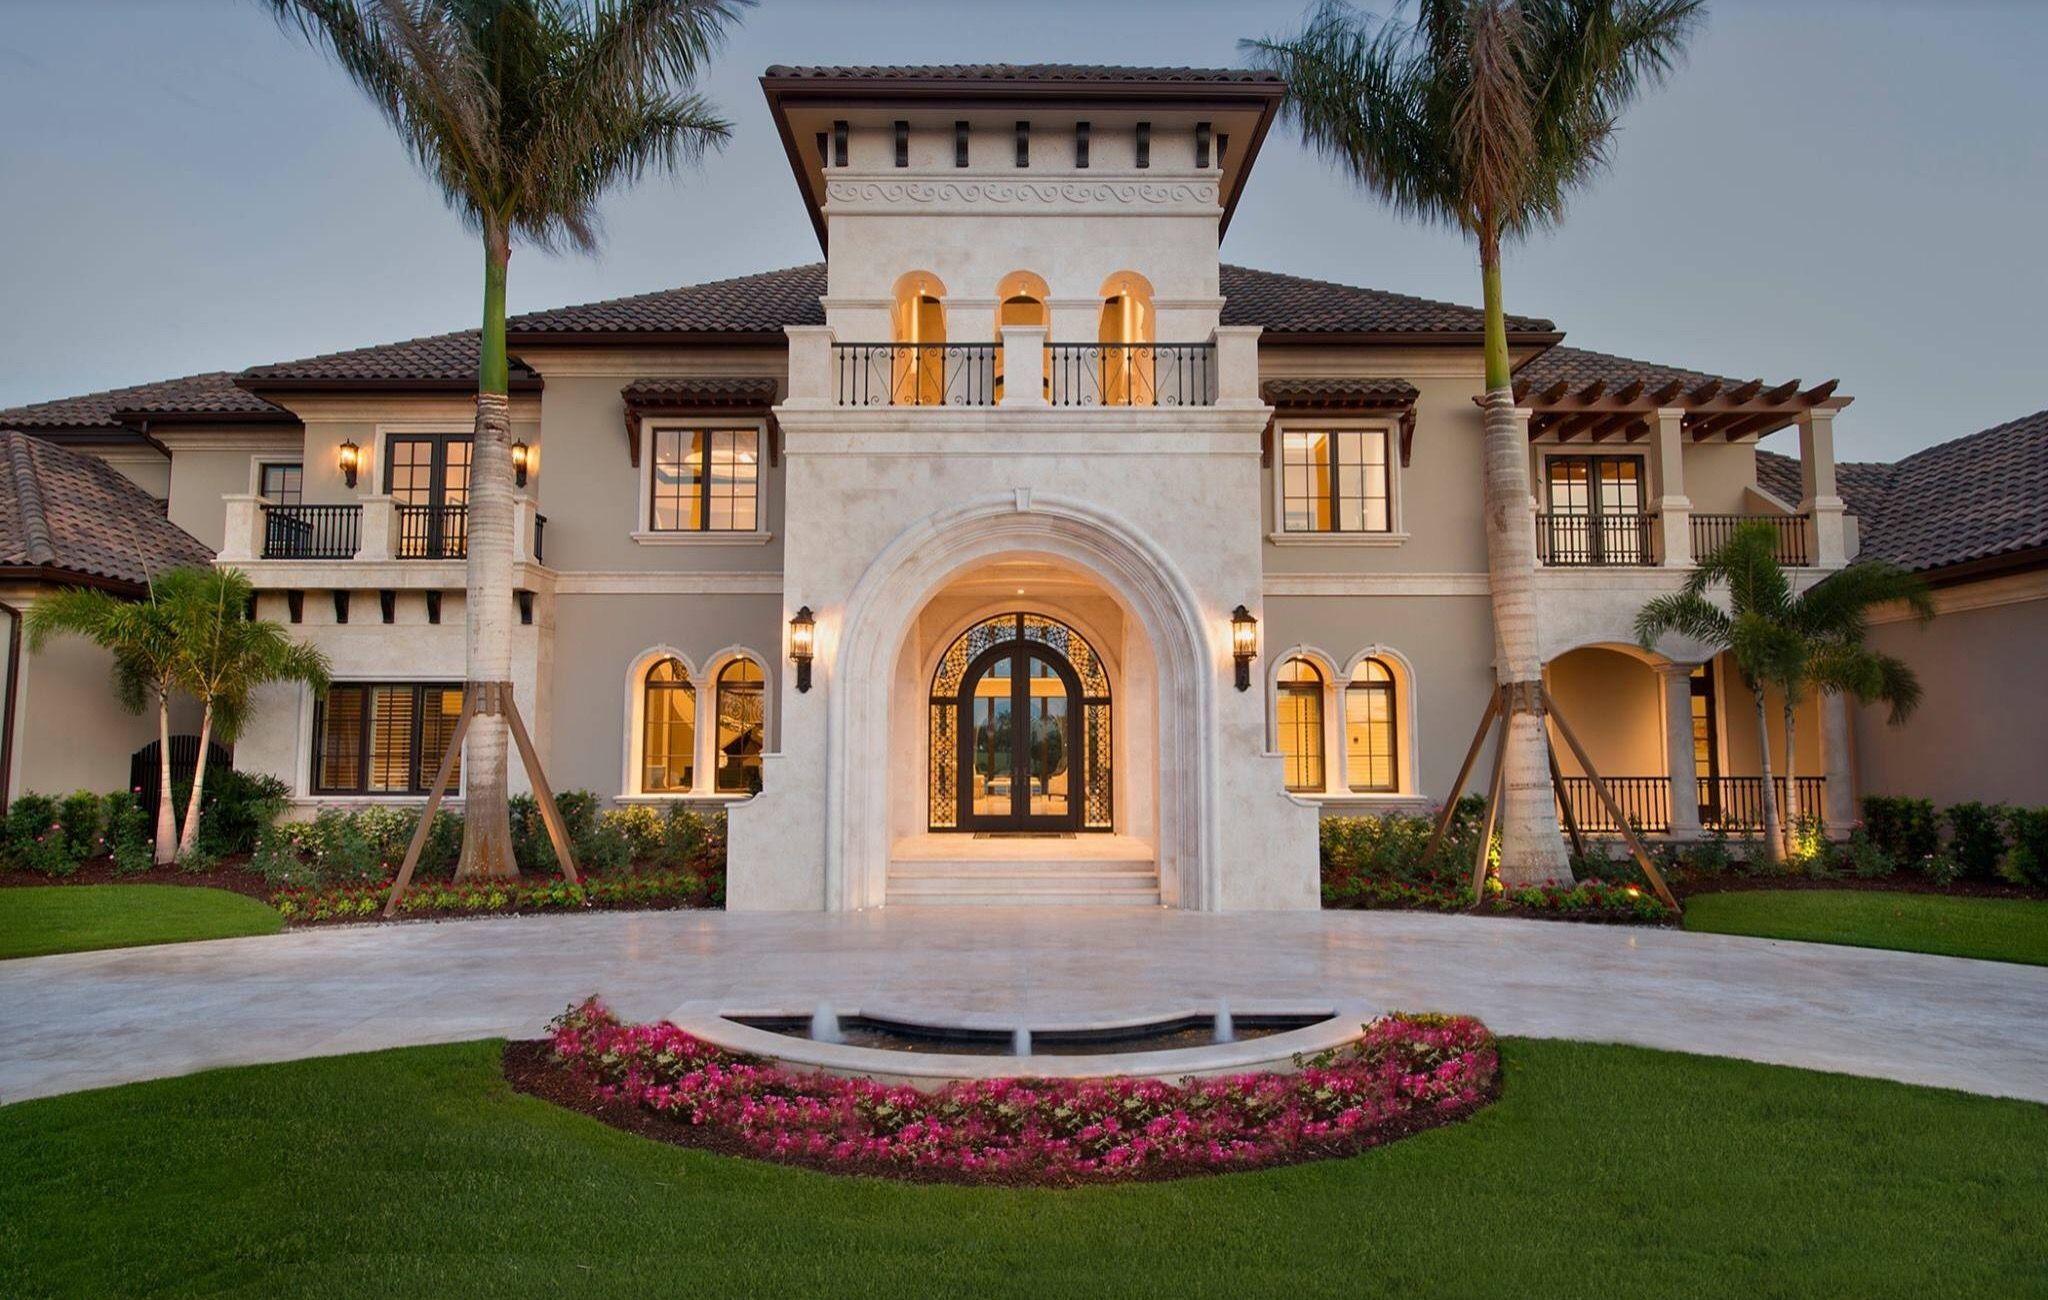 entrance house ideas pinterest exterior exterior design and rh pinterest com